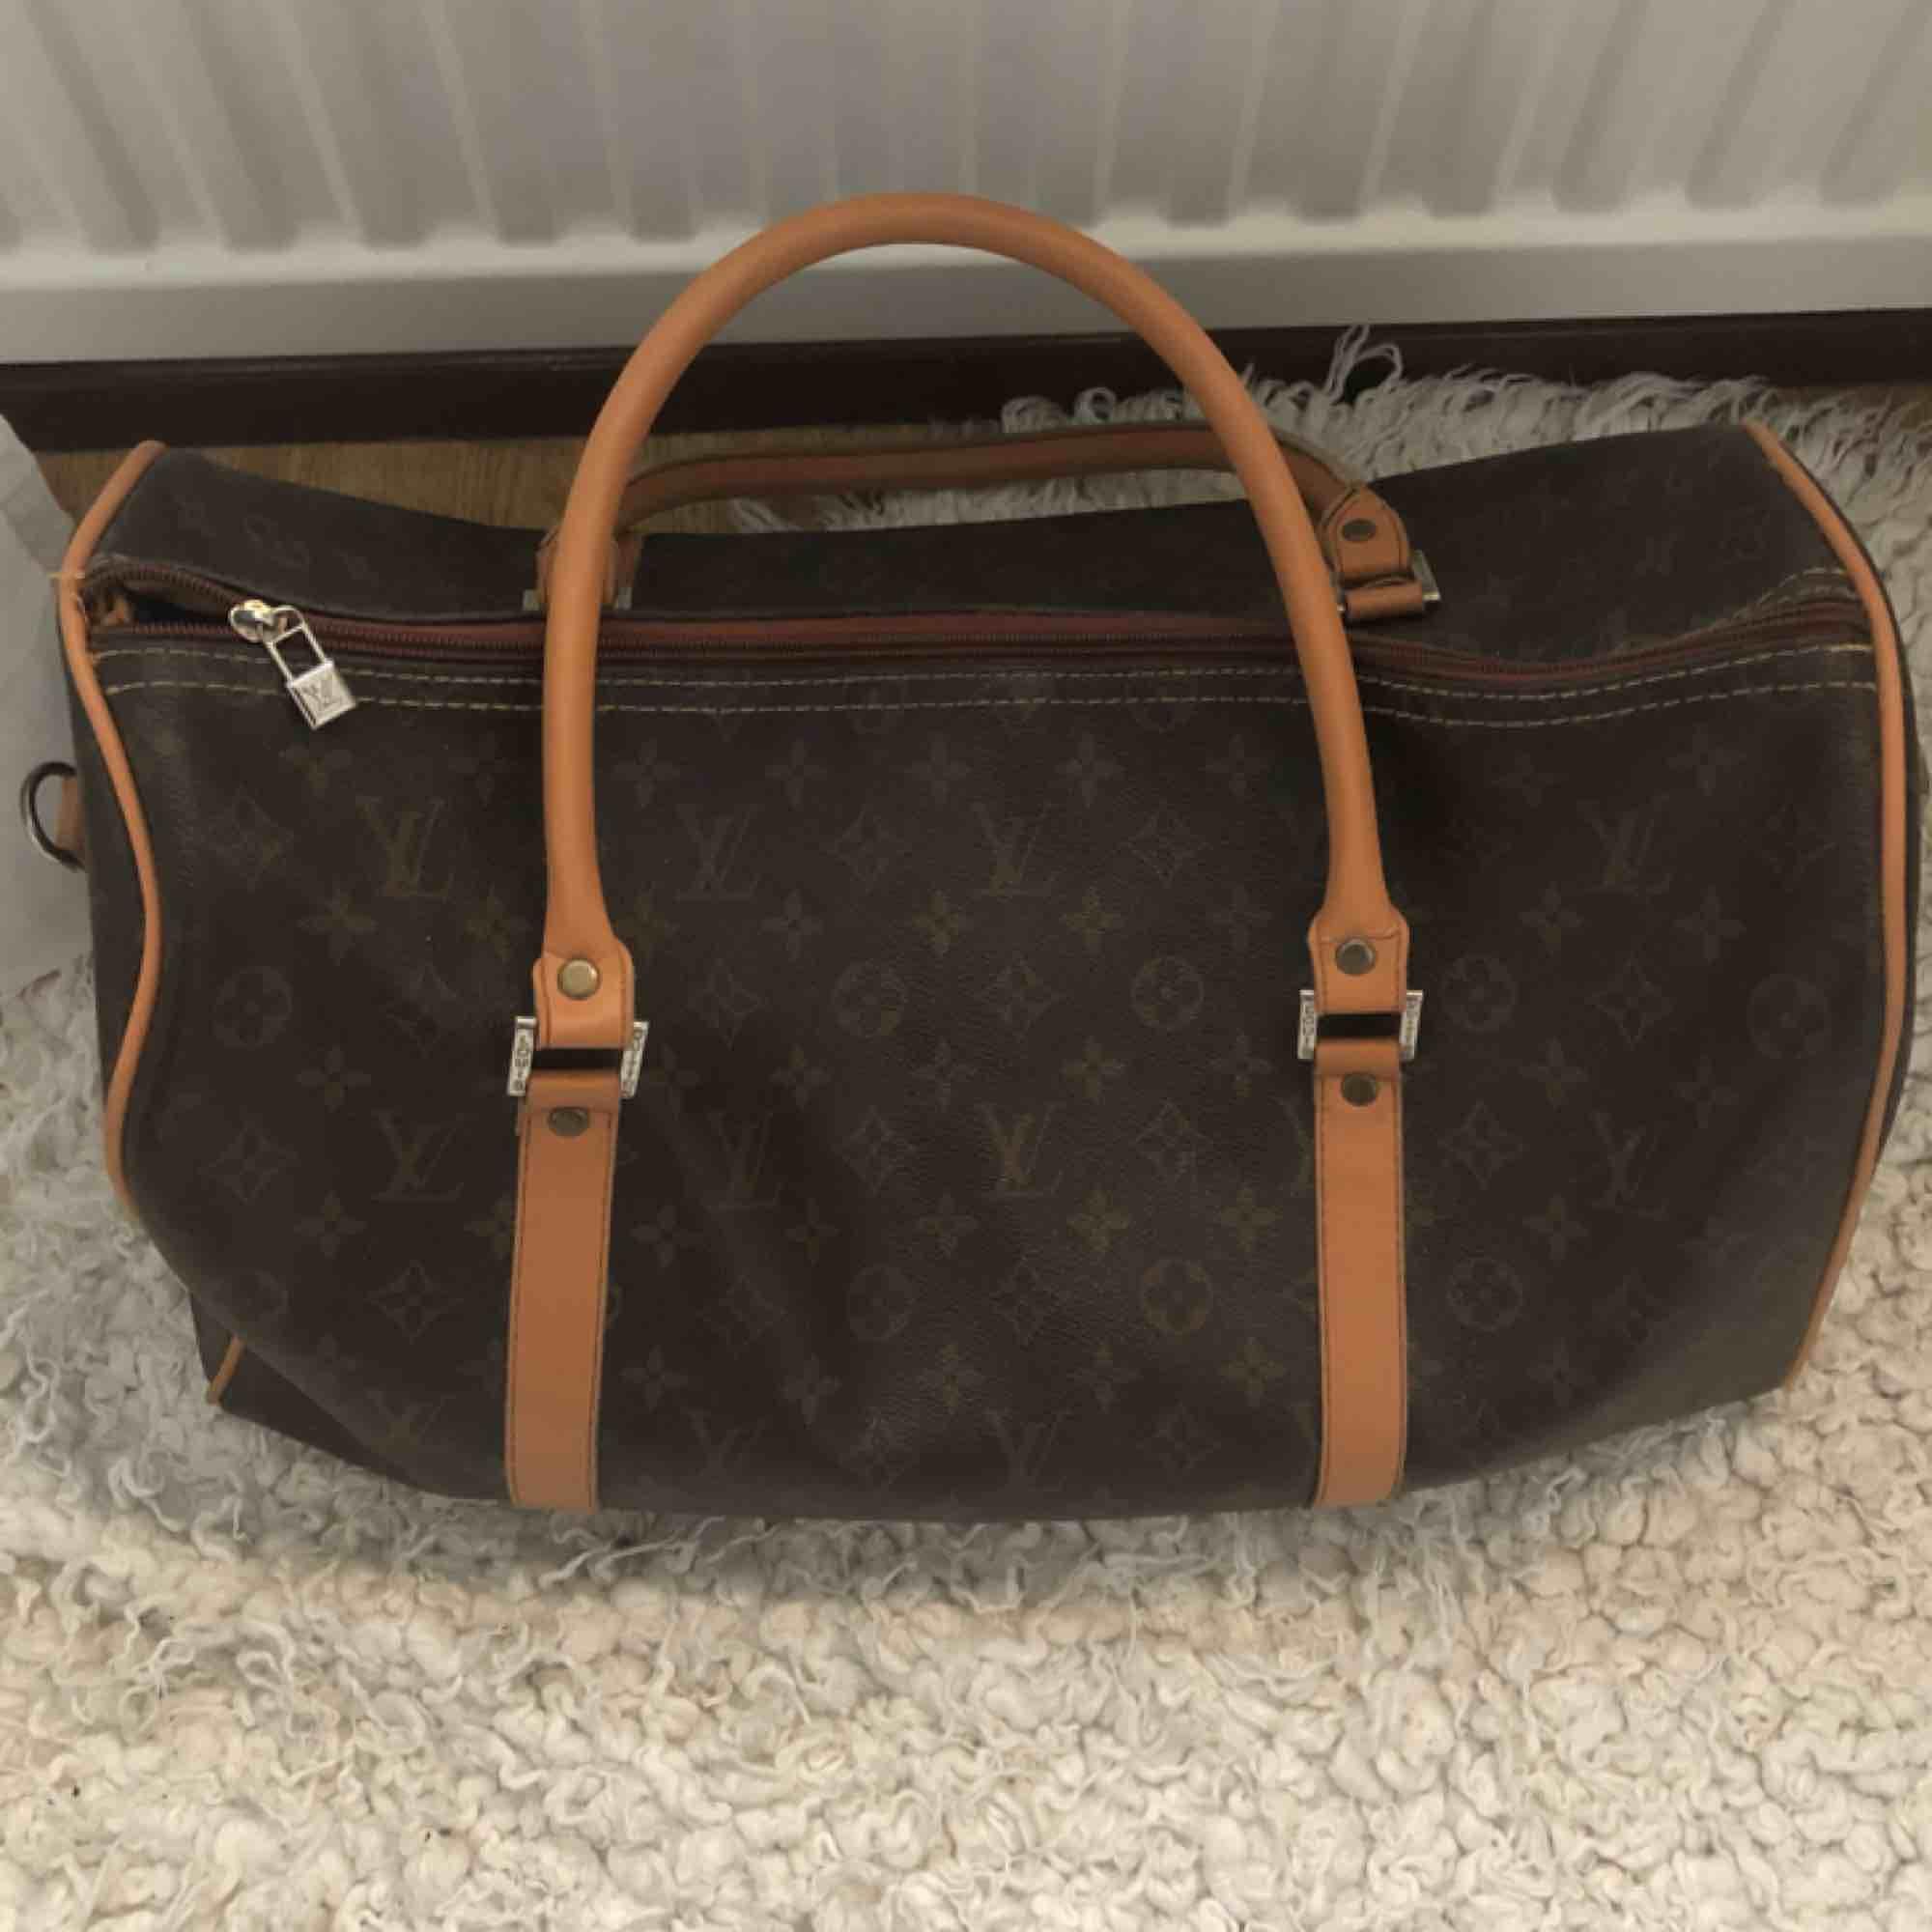 3ce39e8d93254 Louis vuitton - Weekendbag